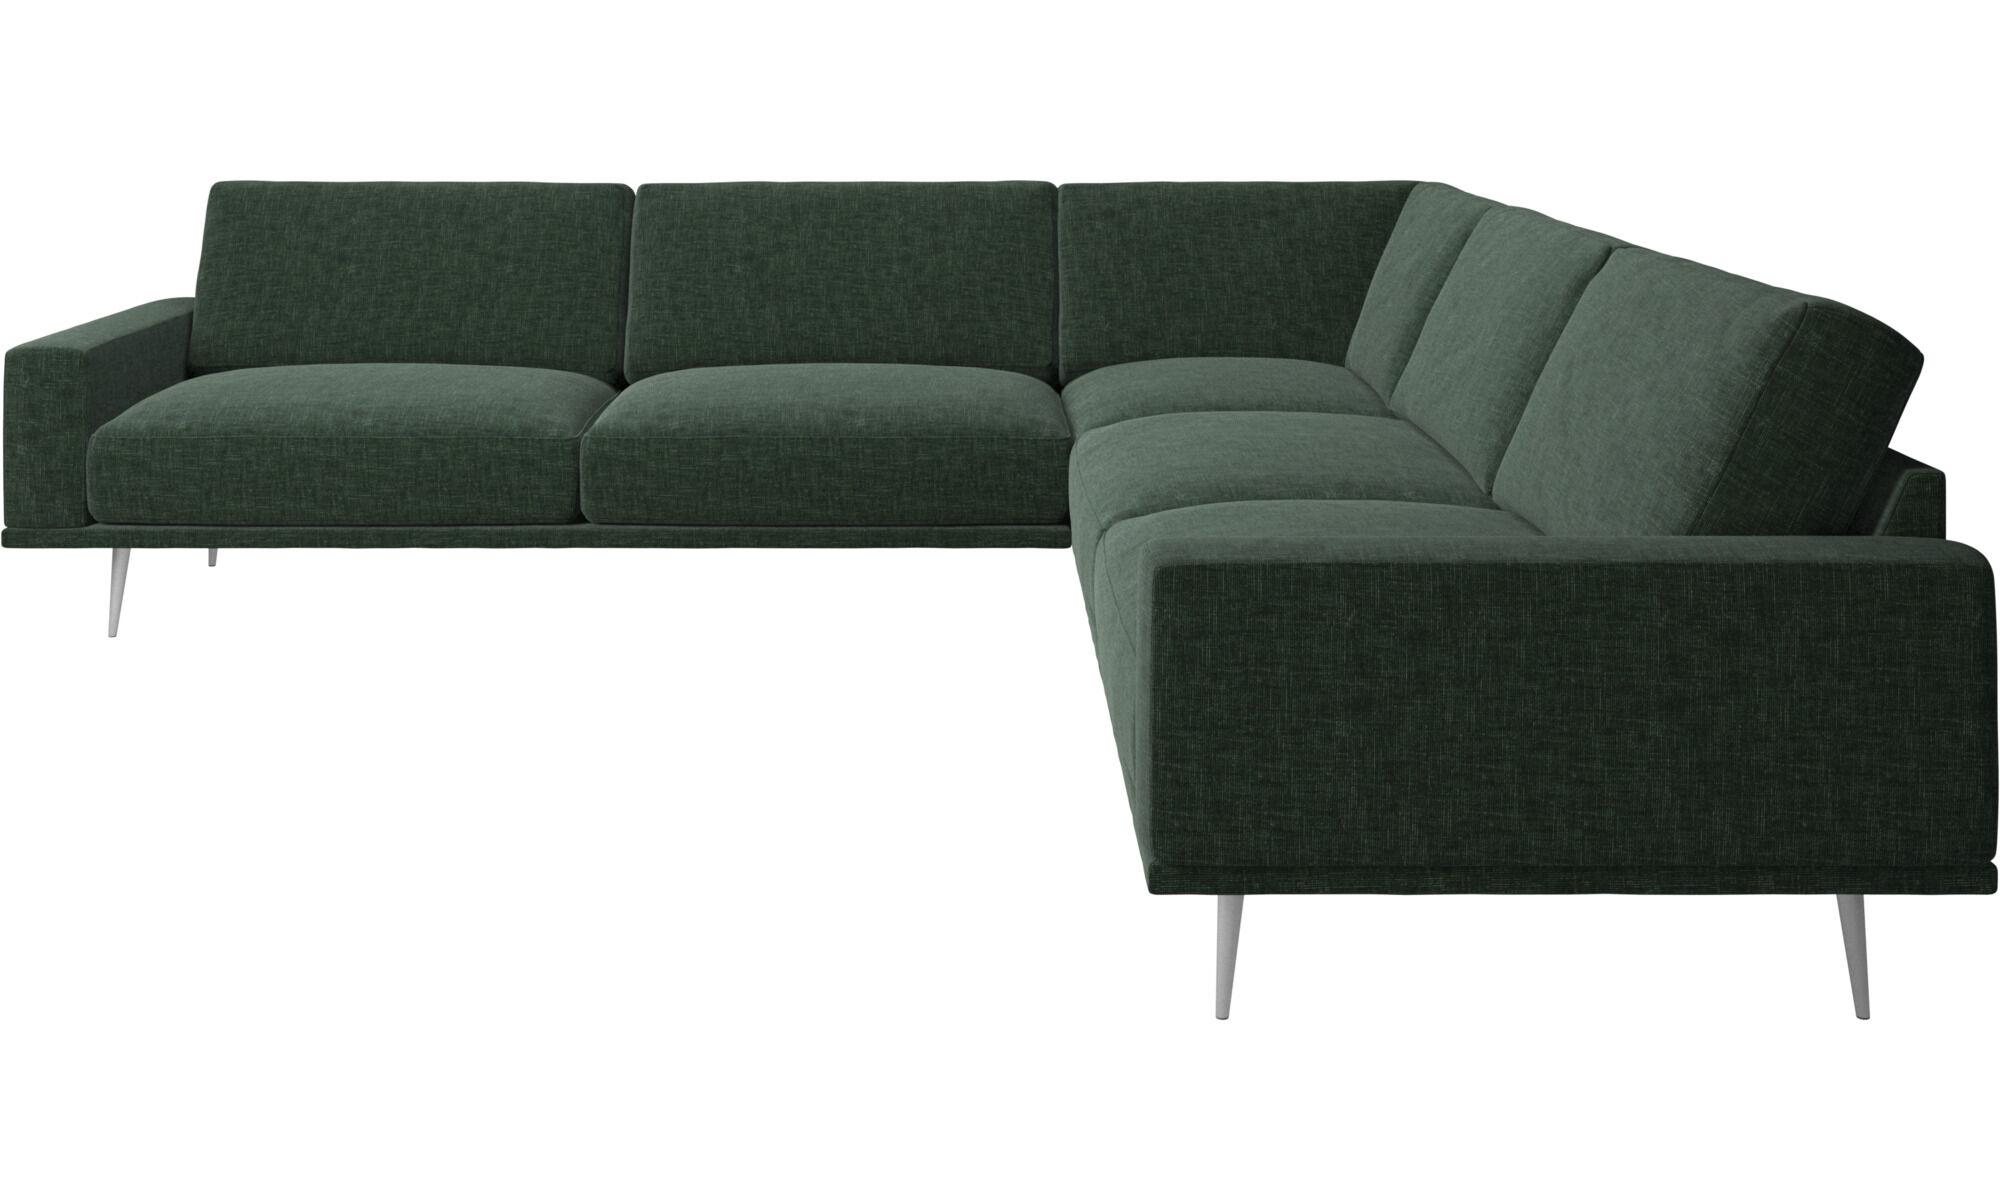 Corner Sofas   Carlton Corner Sofa   Green   Fabric ...